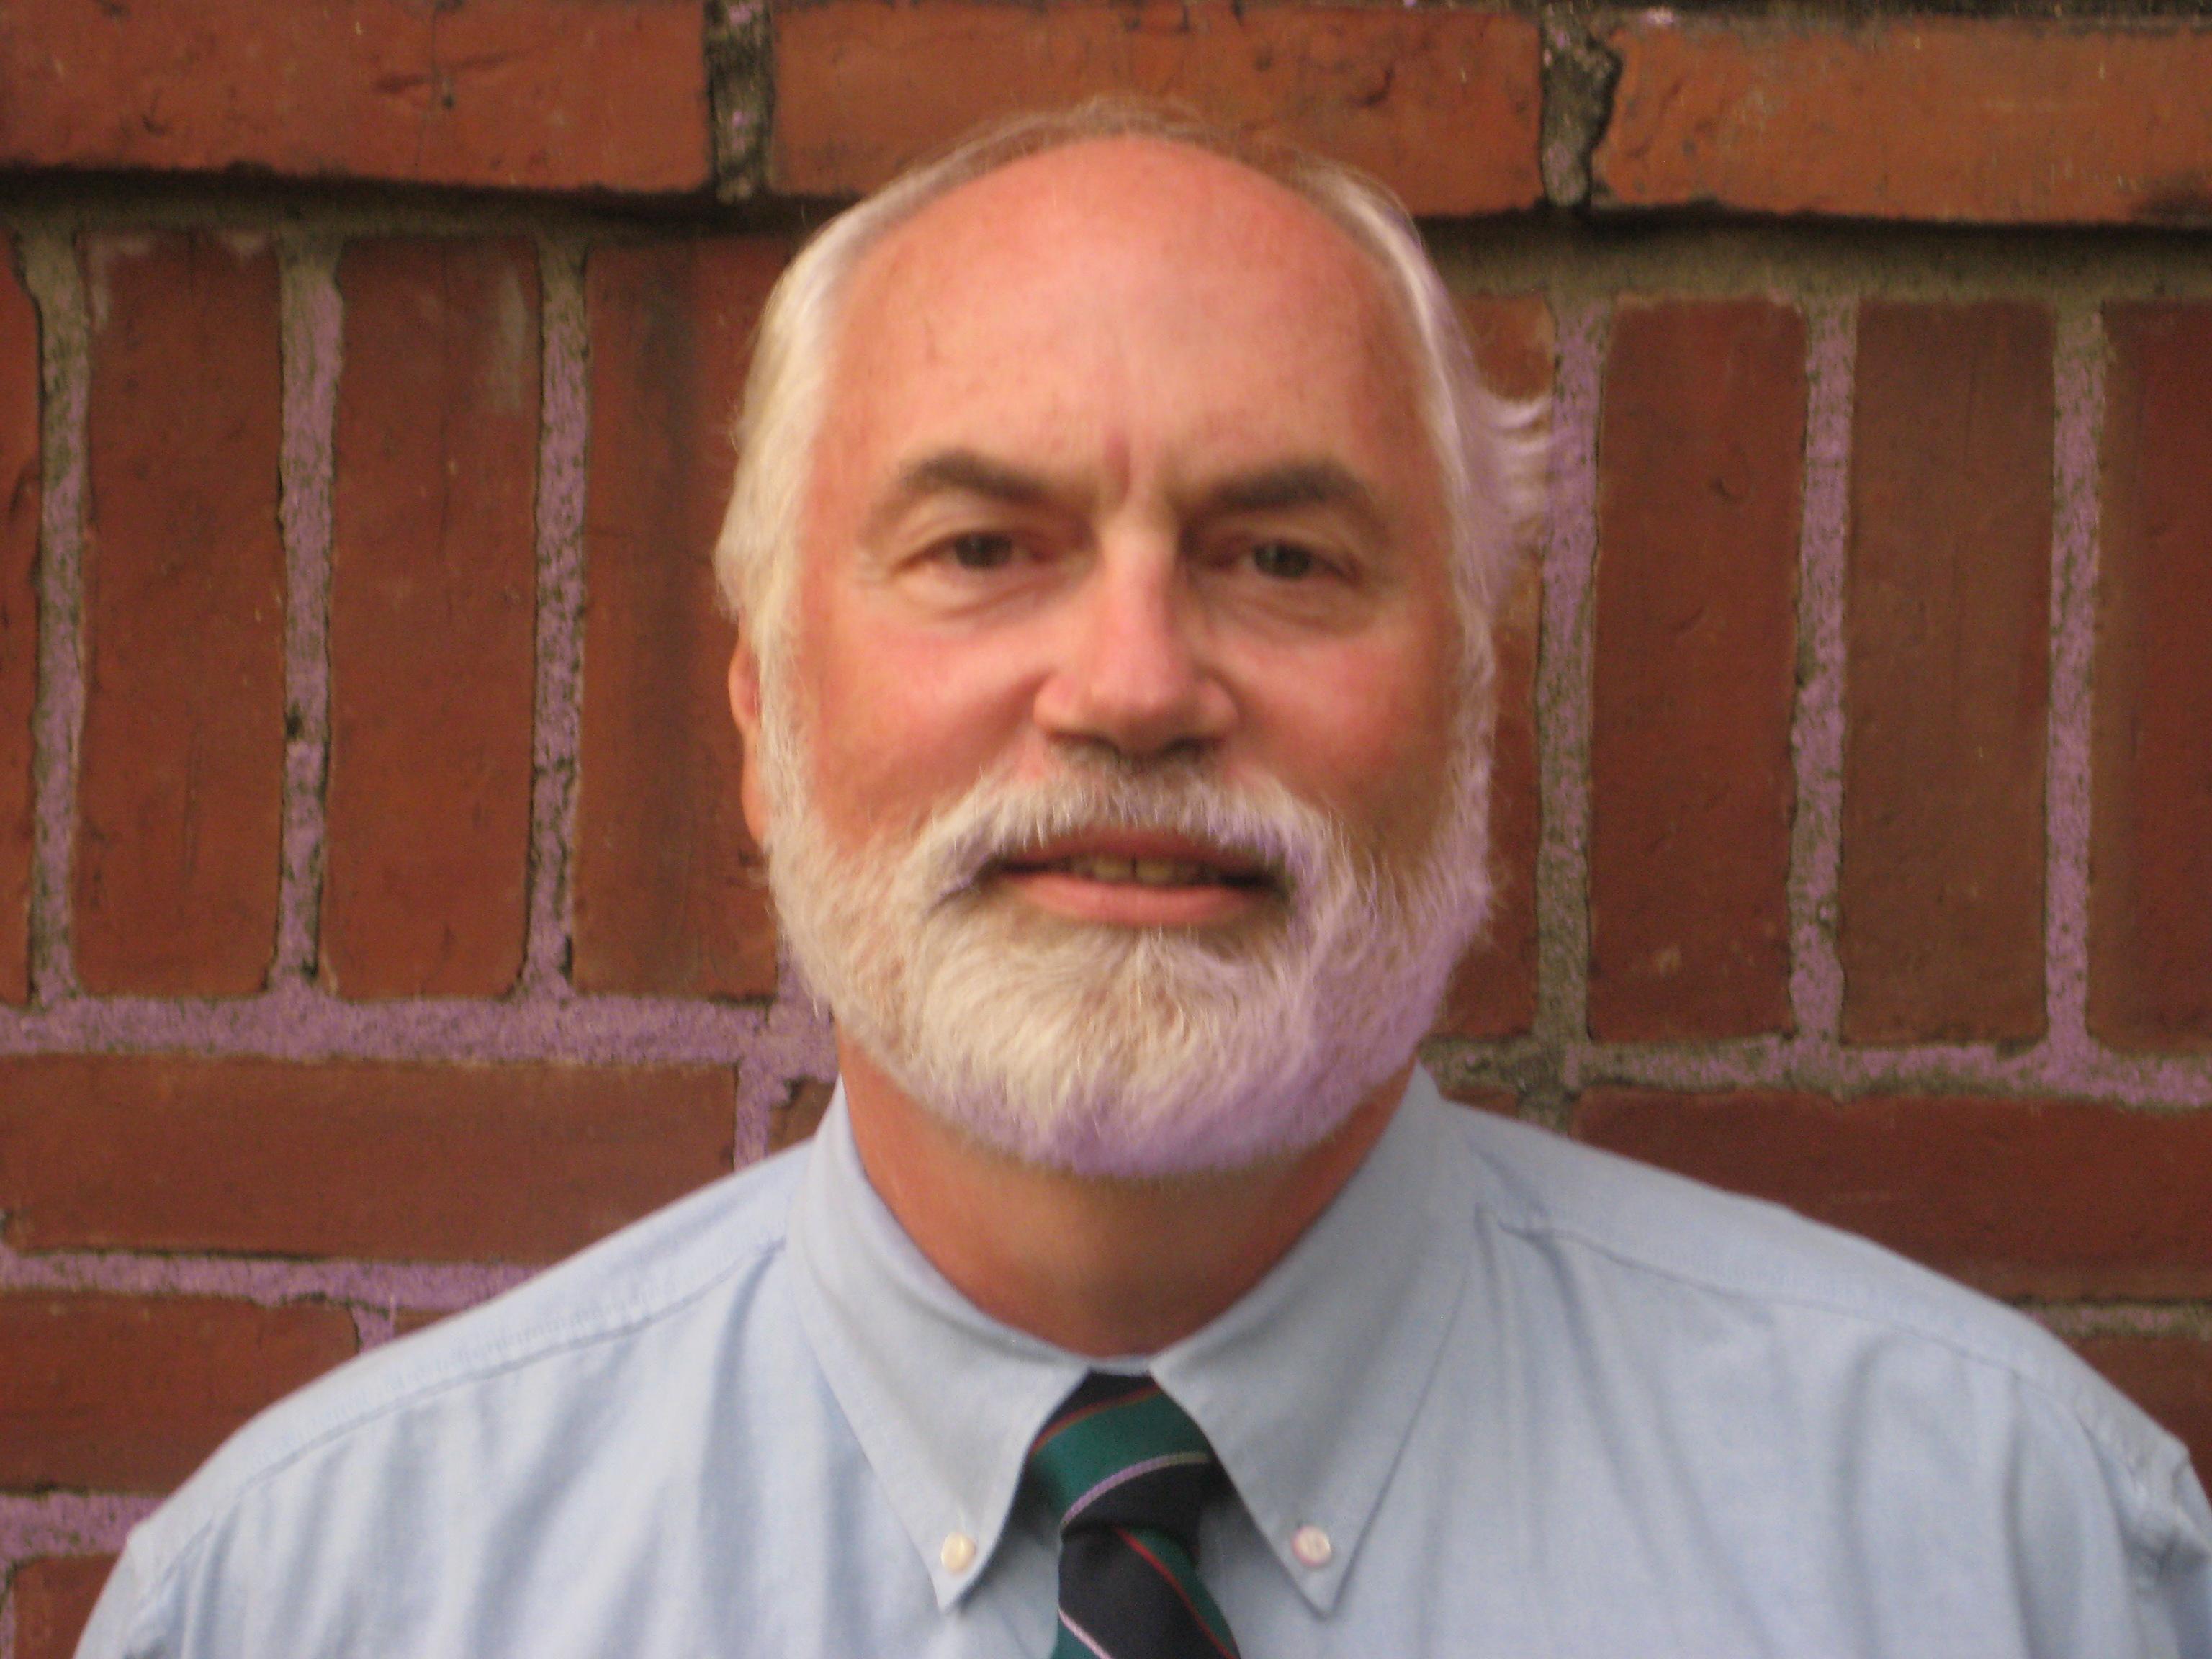 Larry Crist